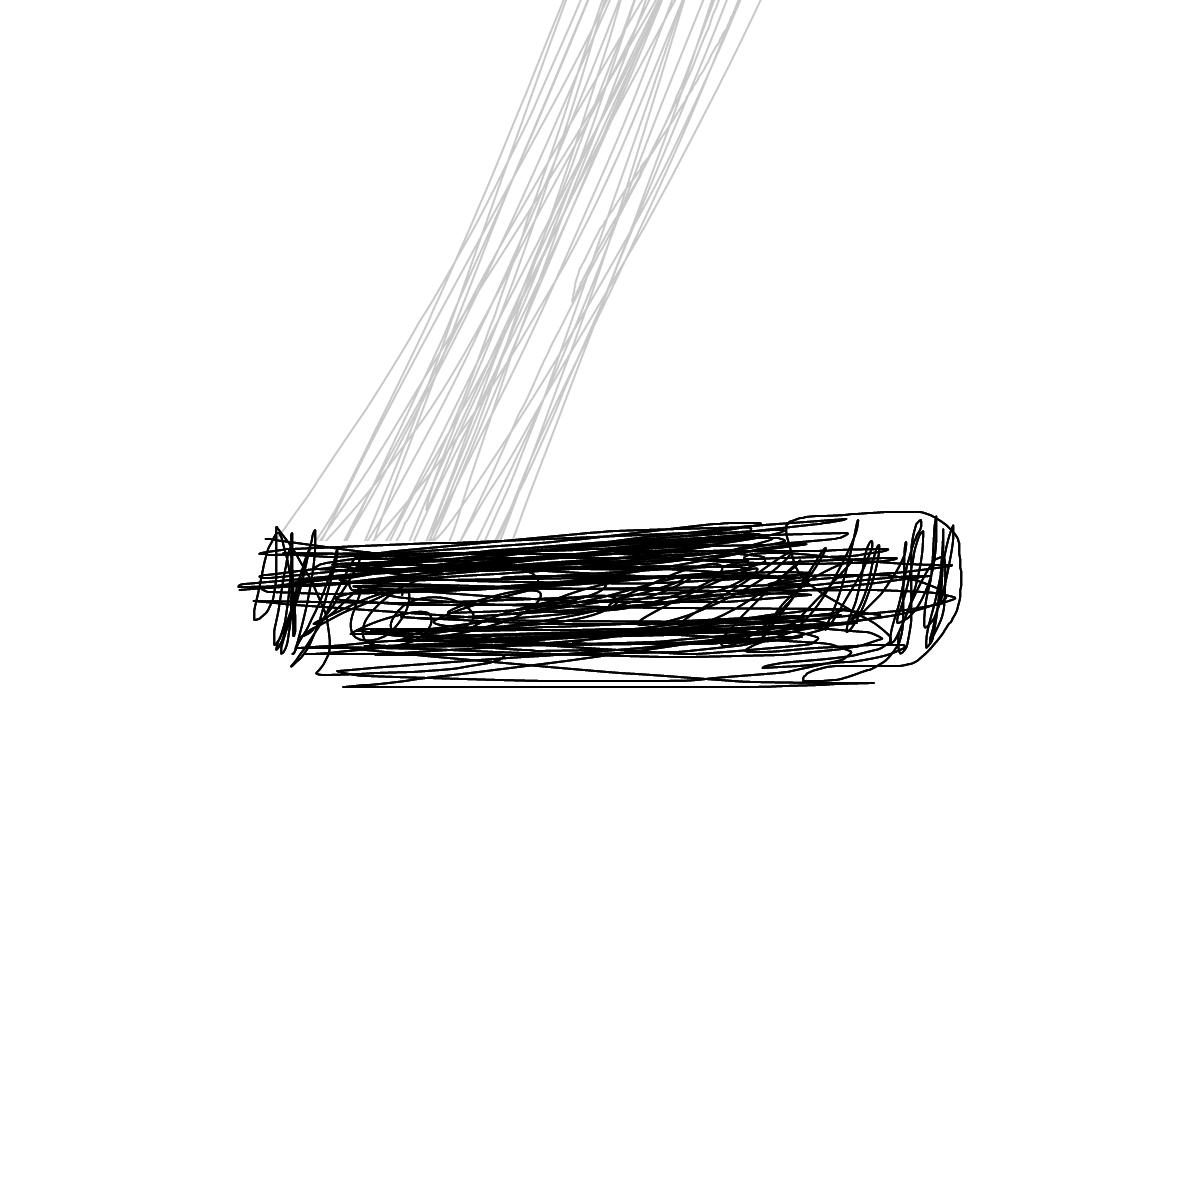 BAAAM drawing#19200 lat:60.3897819519043000lng: 25.6664409637451170